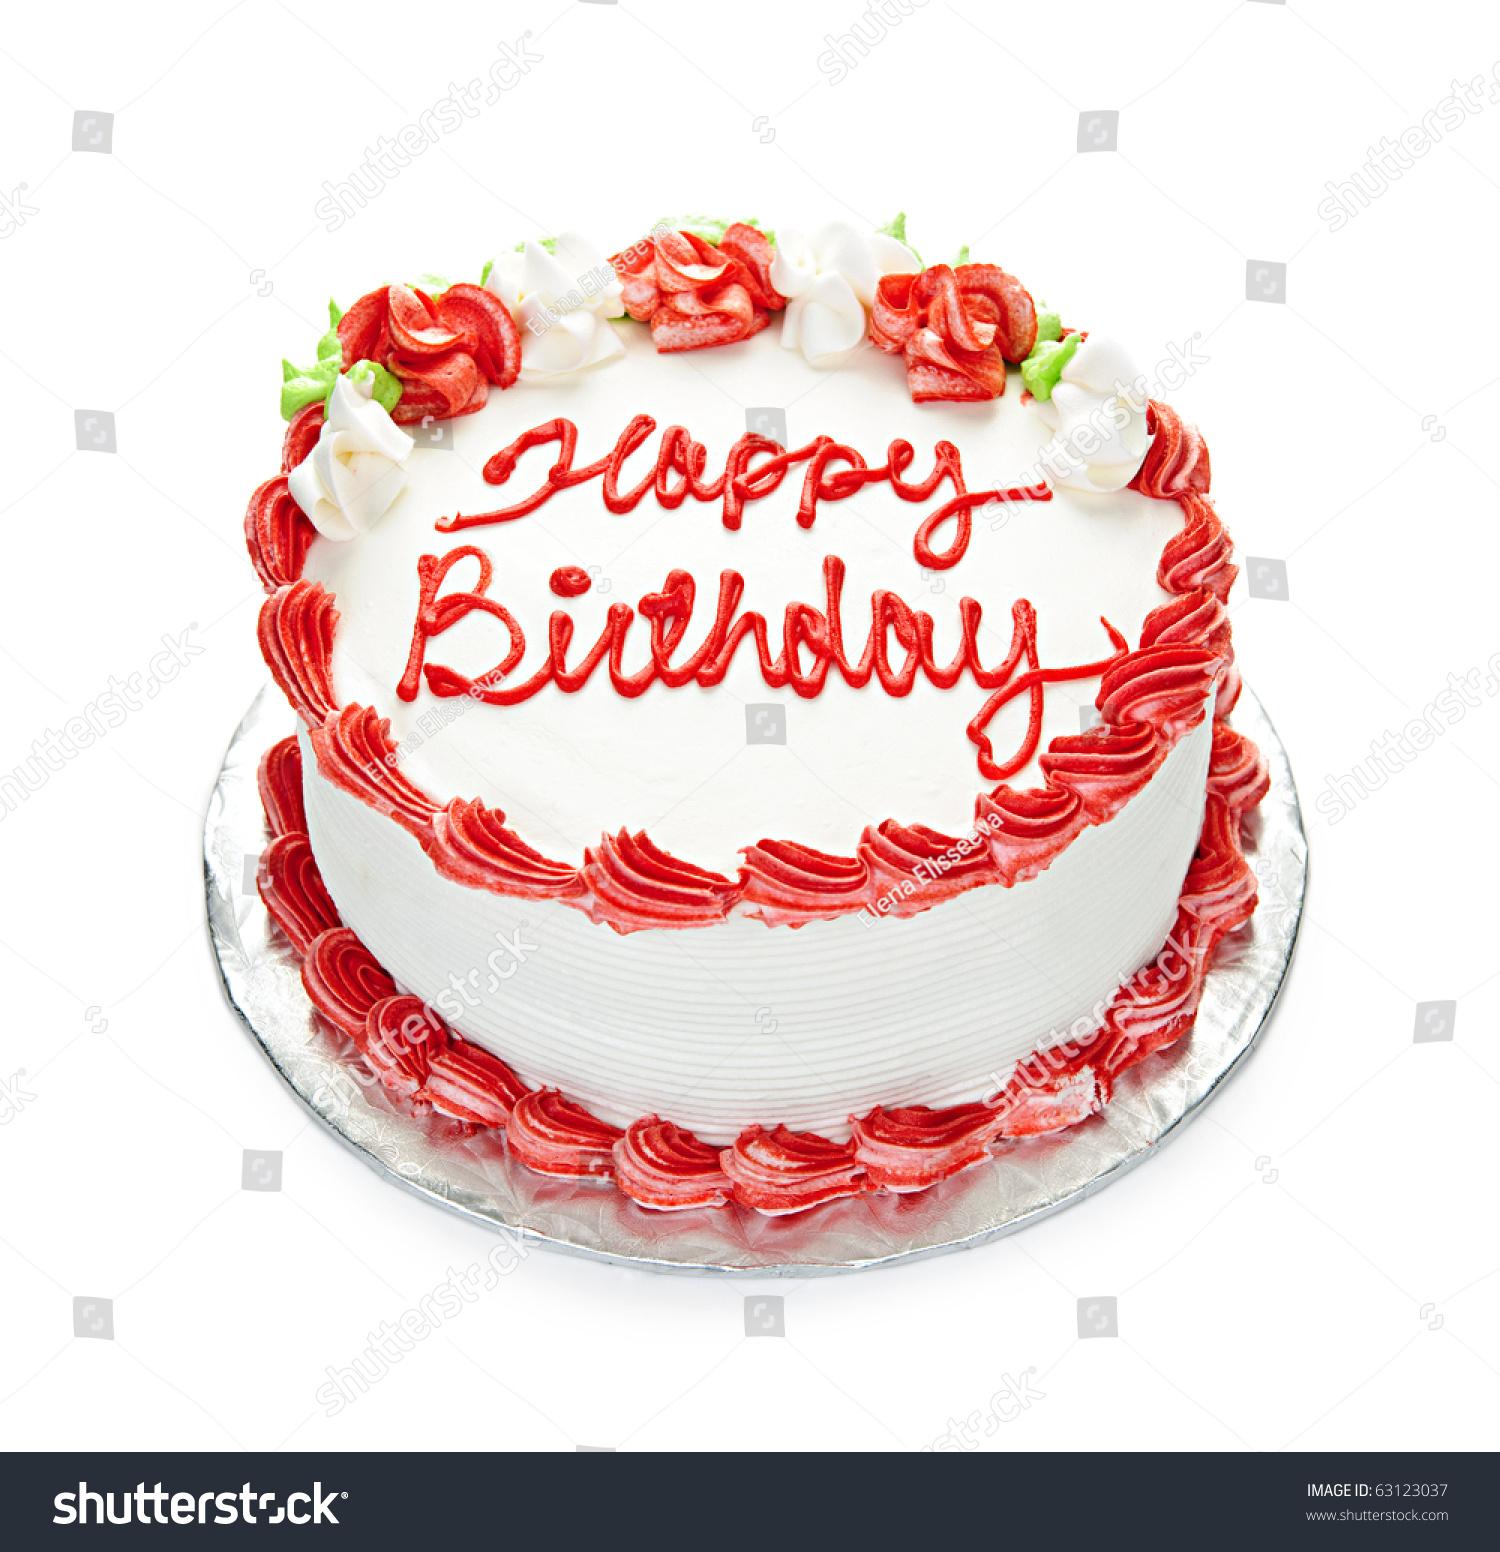 Birthday Cake White Red Icing Isolated Stock Photo